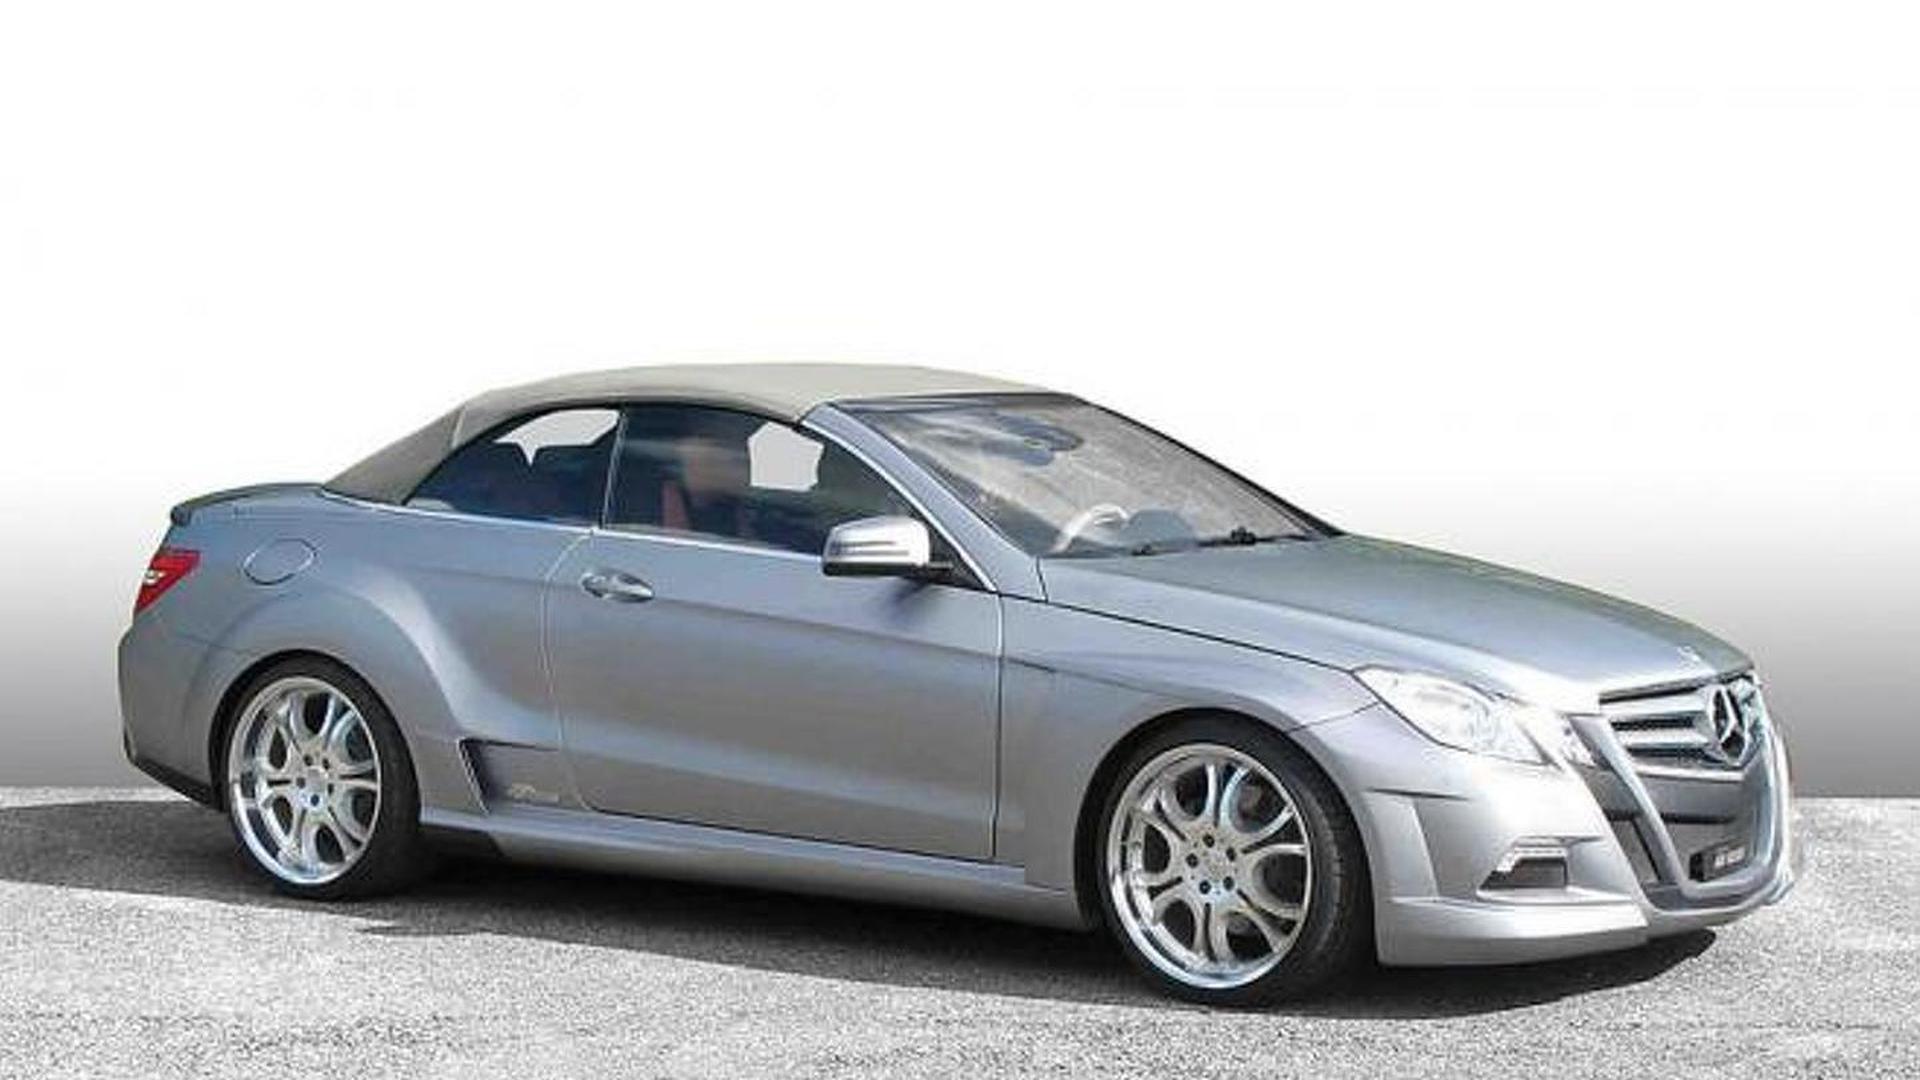 MercedesBenz EClass Coupe Convertible by FAB Design